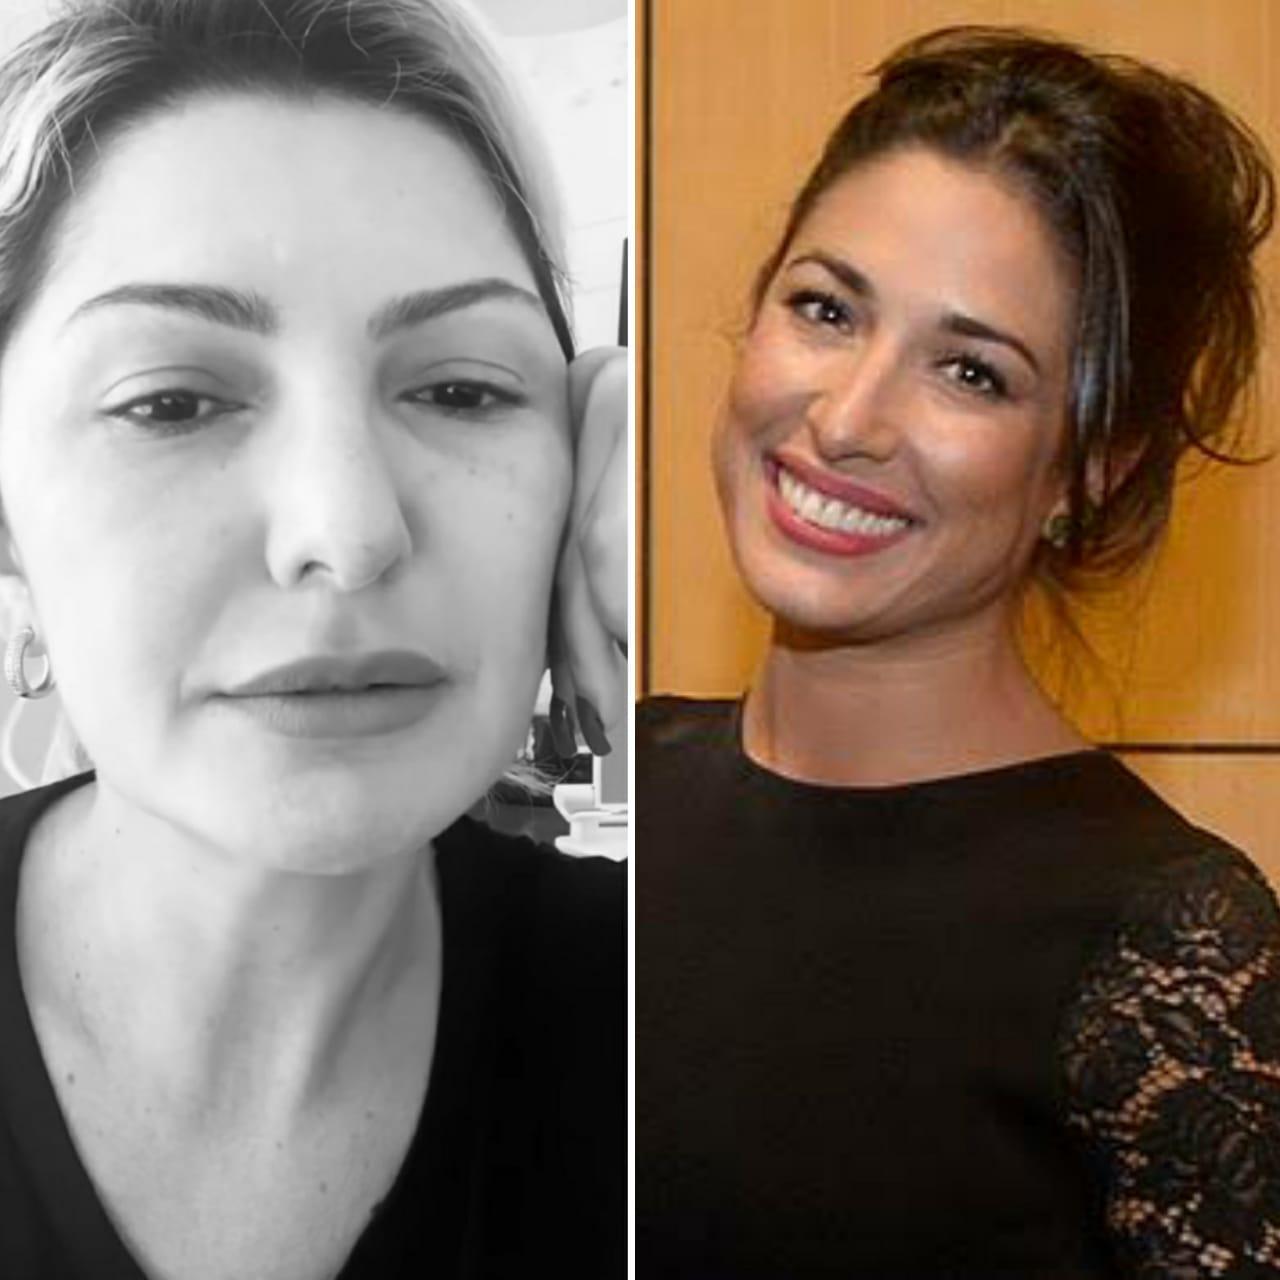 Antonia Fontenelle rebate acusação de xenofobia feita por Giselle Itié